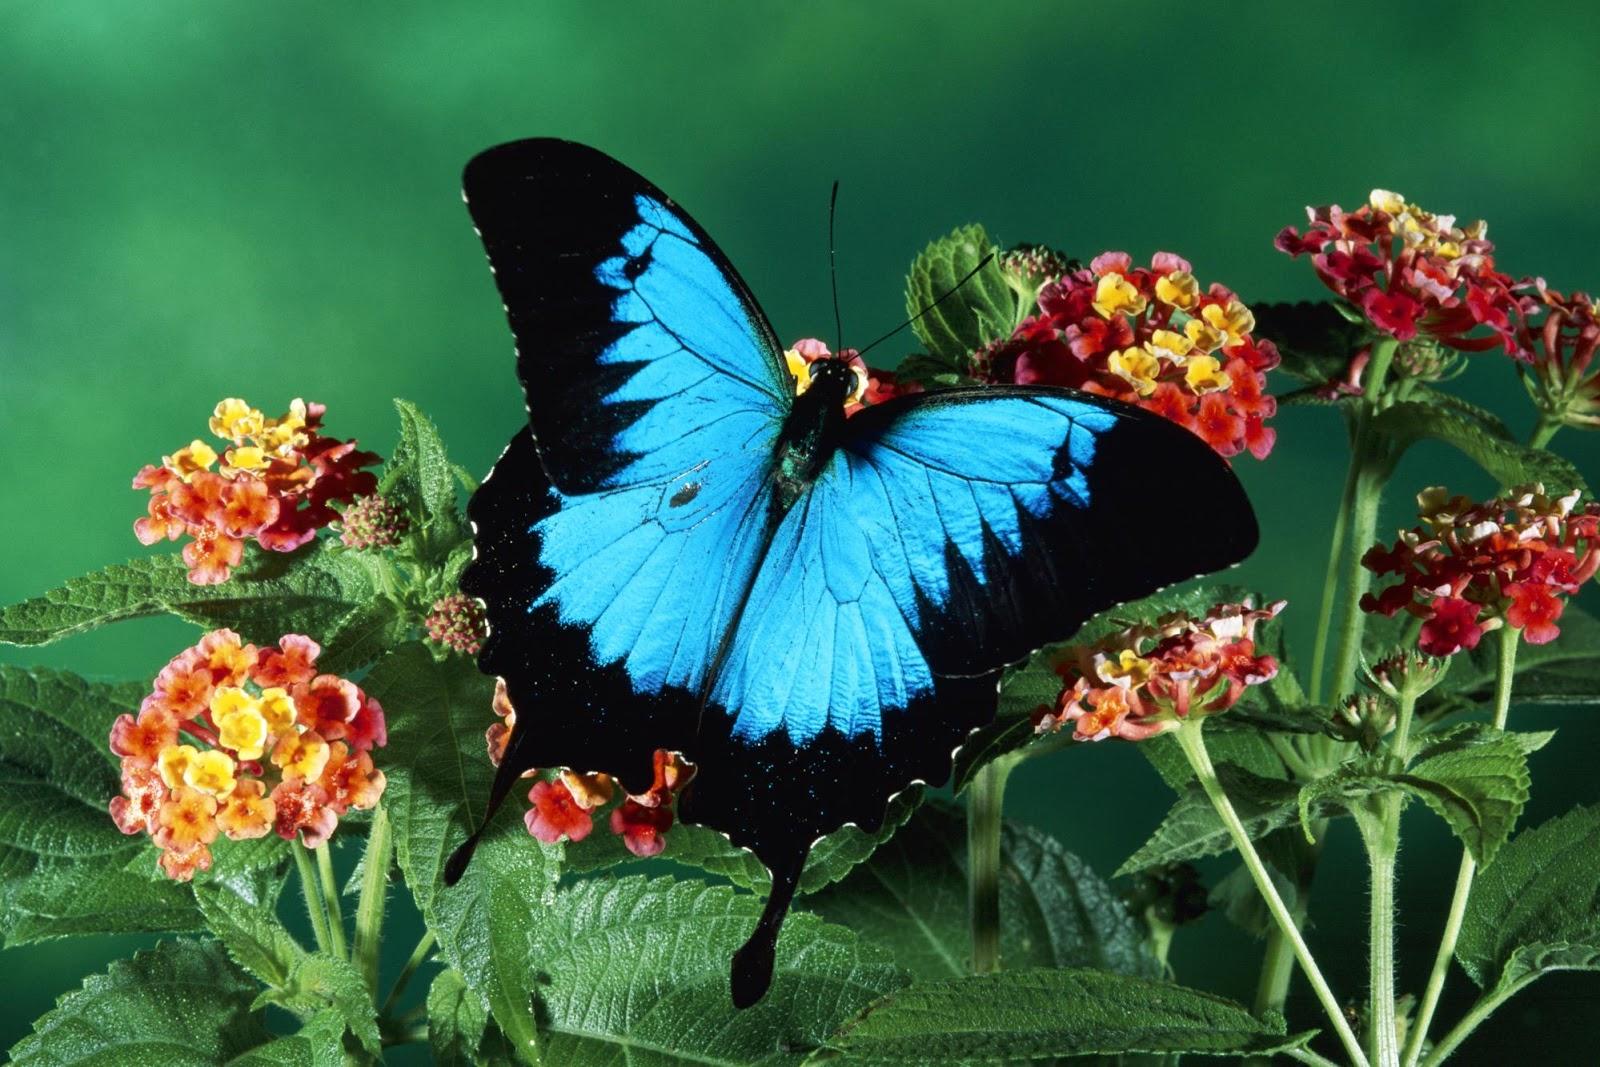 Butterfly Wallpapers - Butterfly Sitting On Flowers , HD Wallpaper & Backgrounds